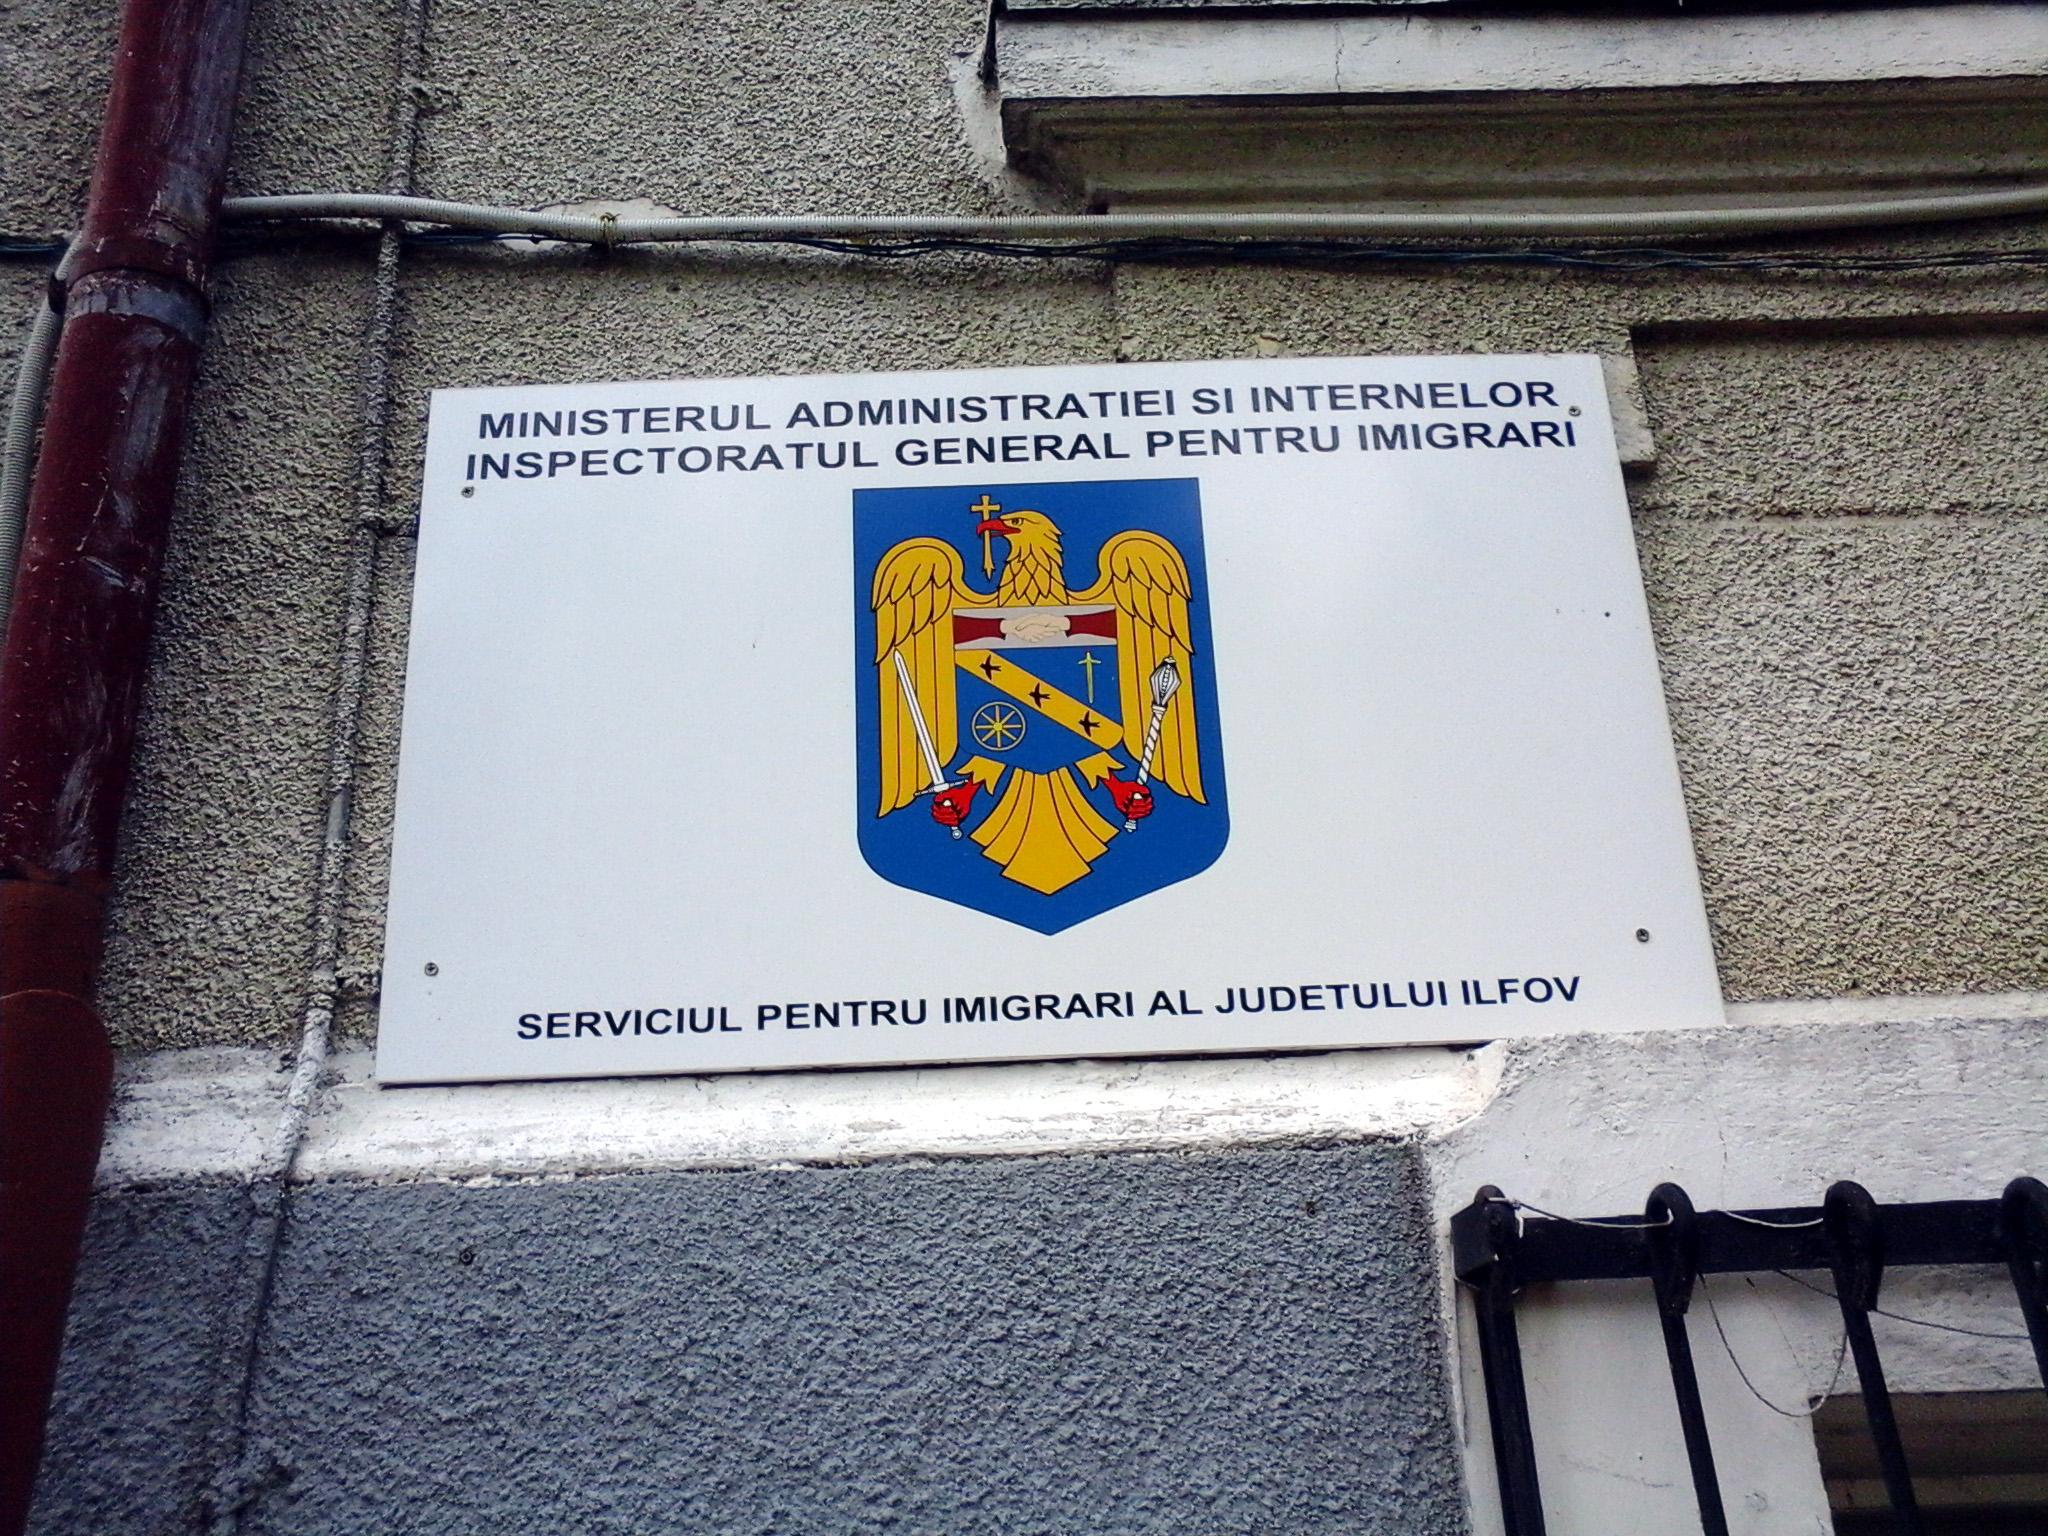 Imigrari Ilfov